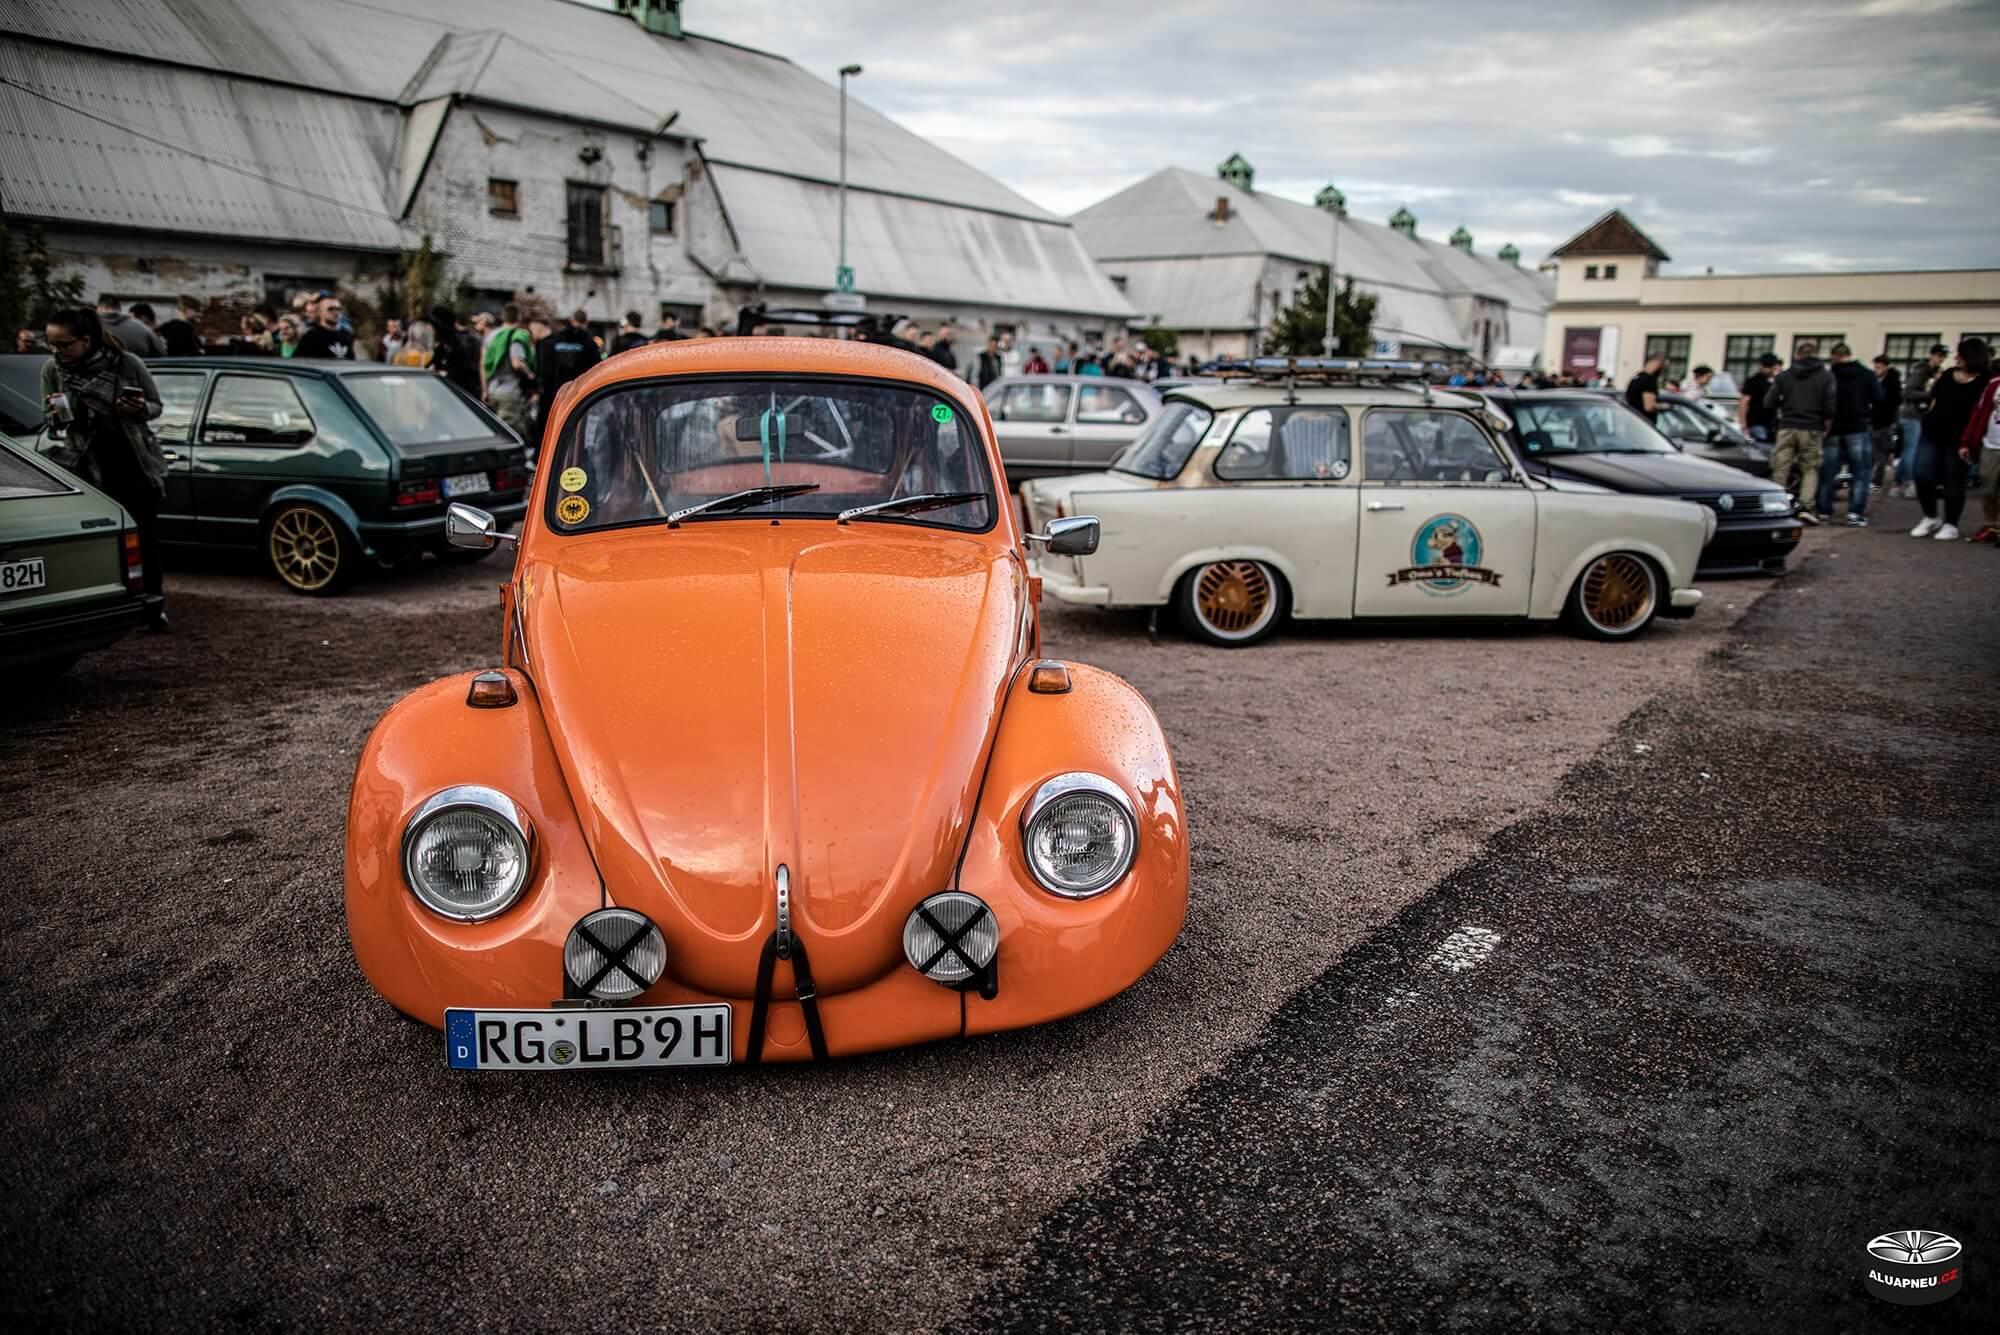 Trabant 601 tuning alu kola - Vw Beetle orange - XS Classic Carnight 5.0 - Drážďany tuning sraz 2019 - www.aluapneu.cz